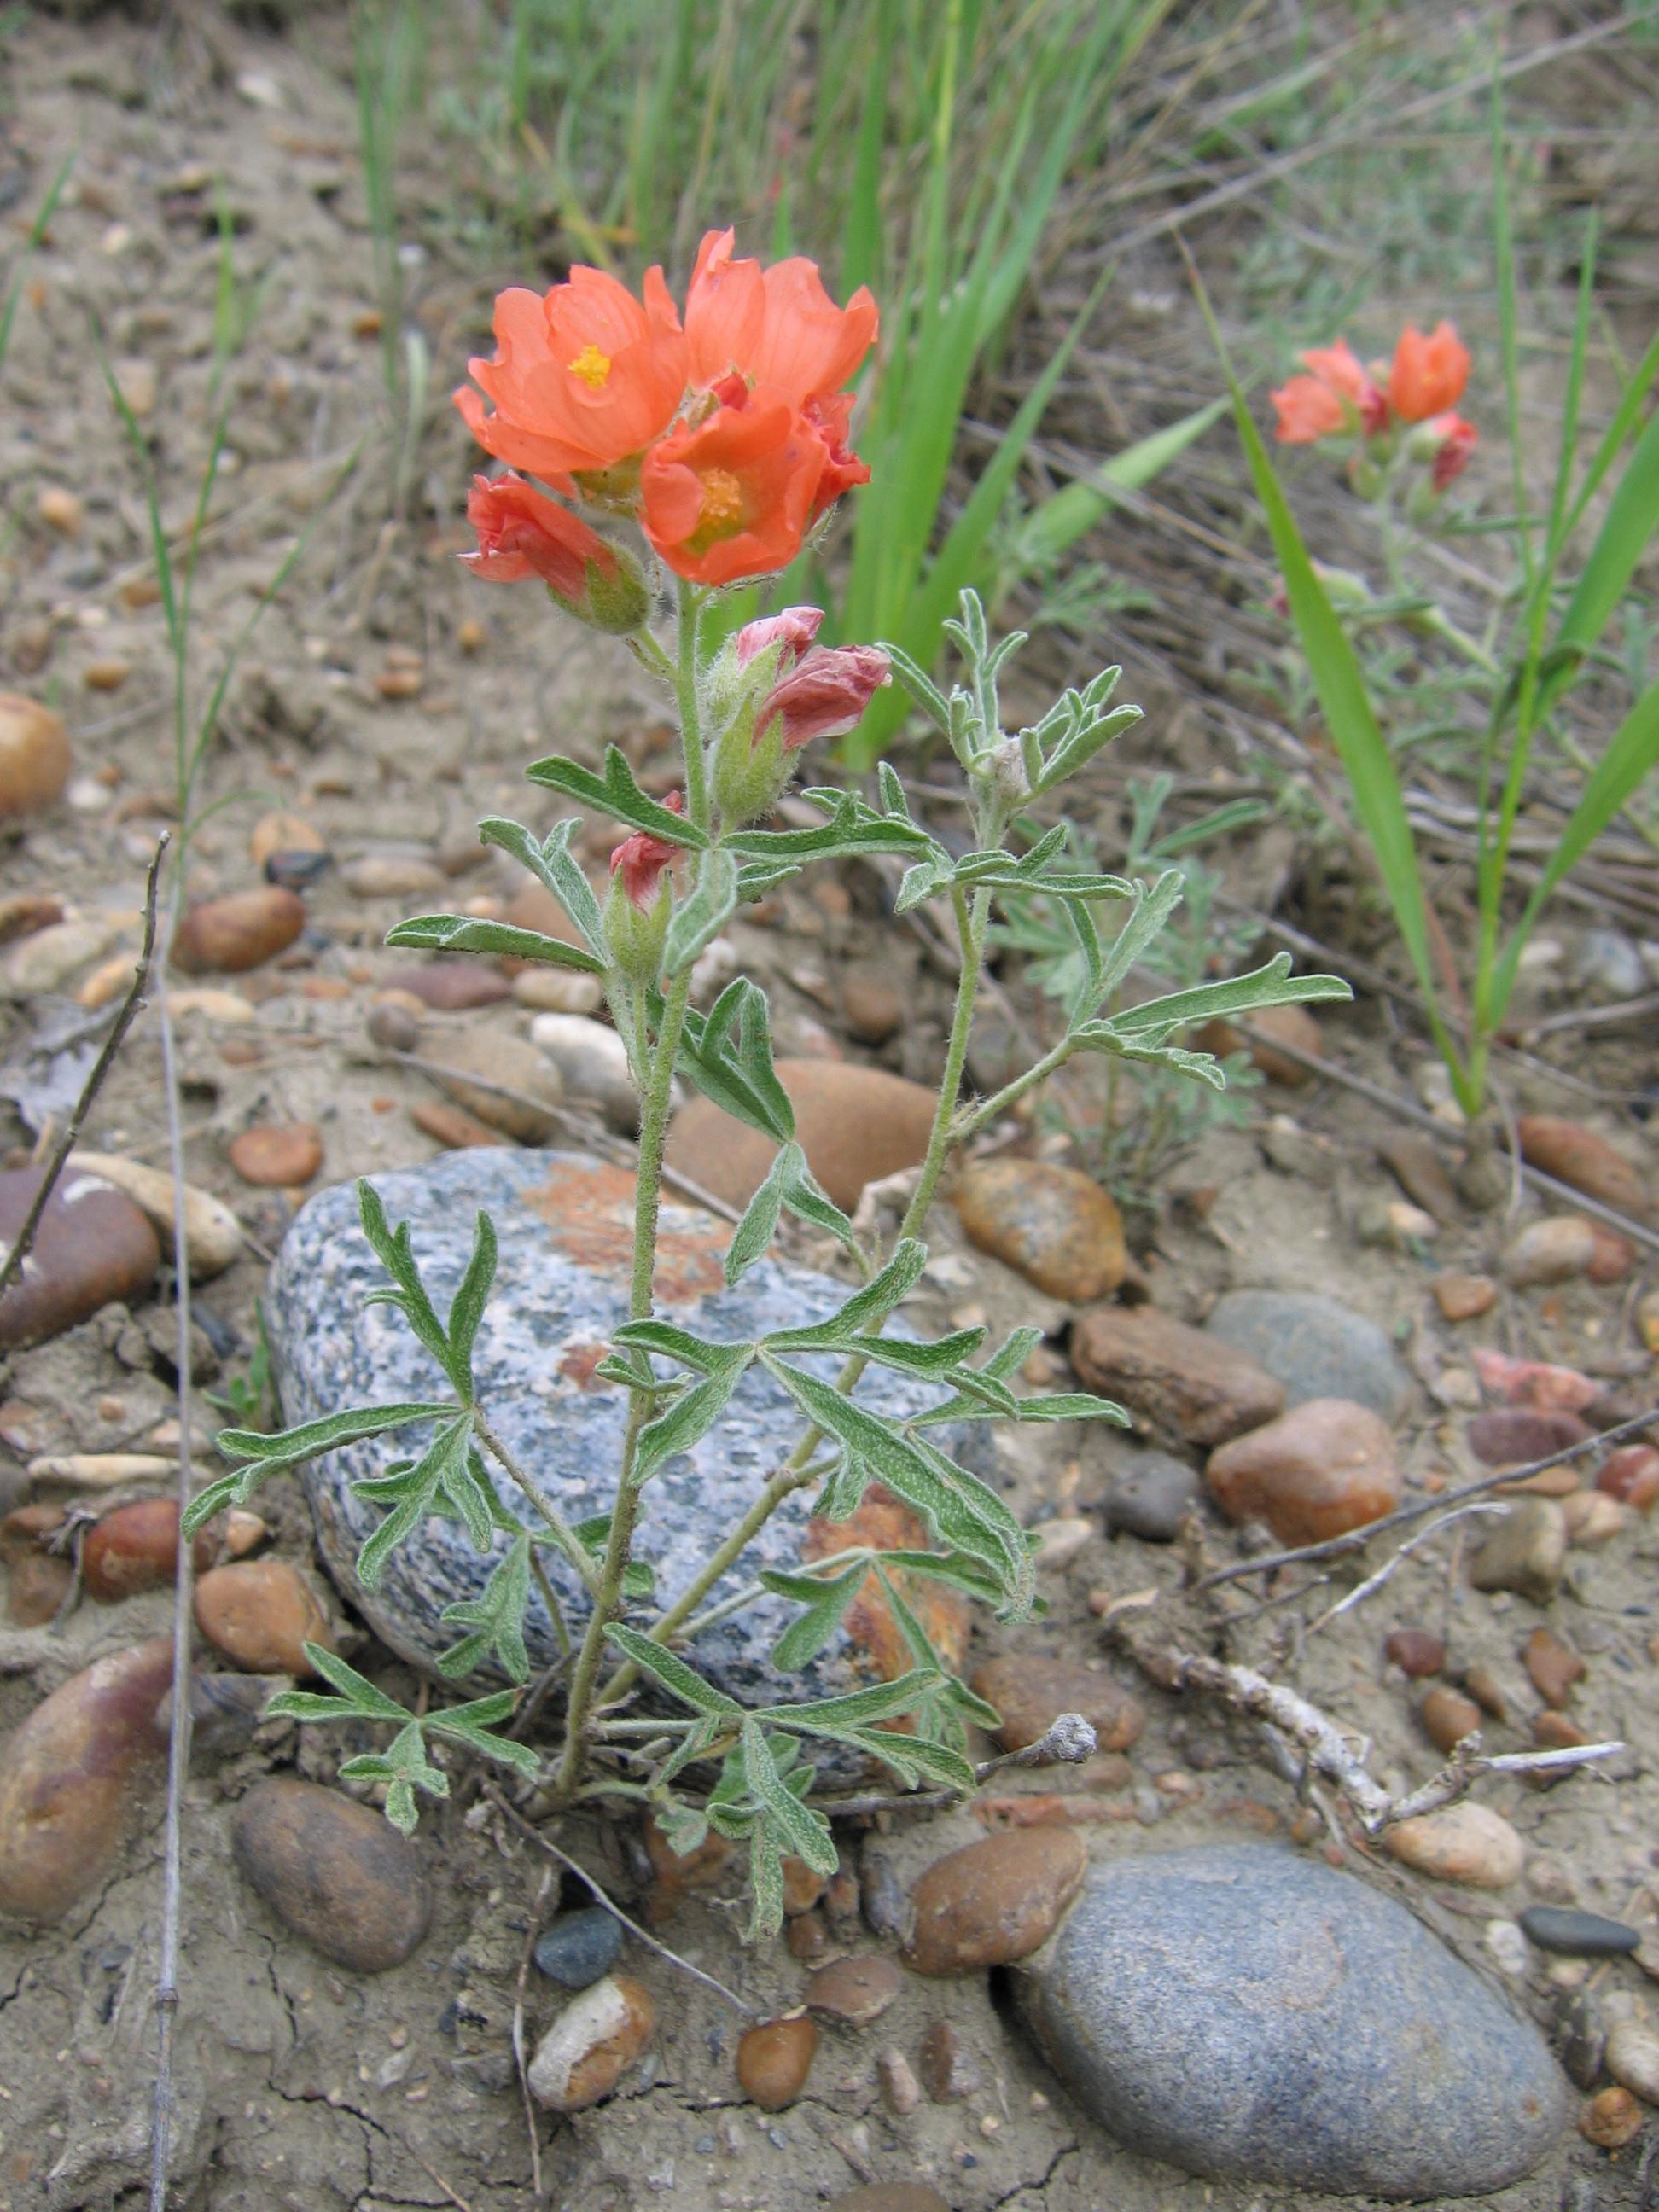 Image of scarlet globemallow